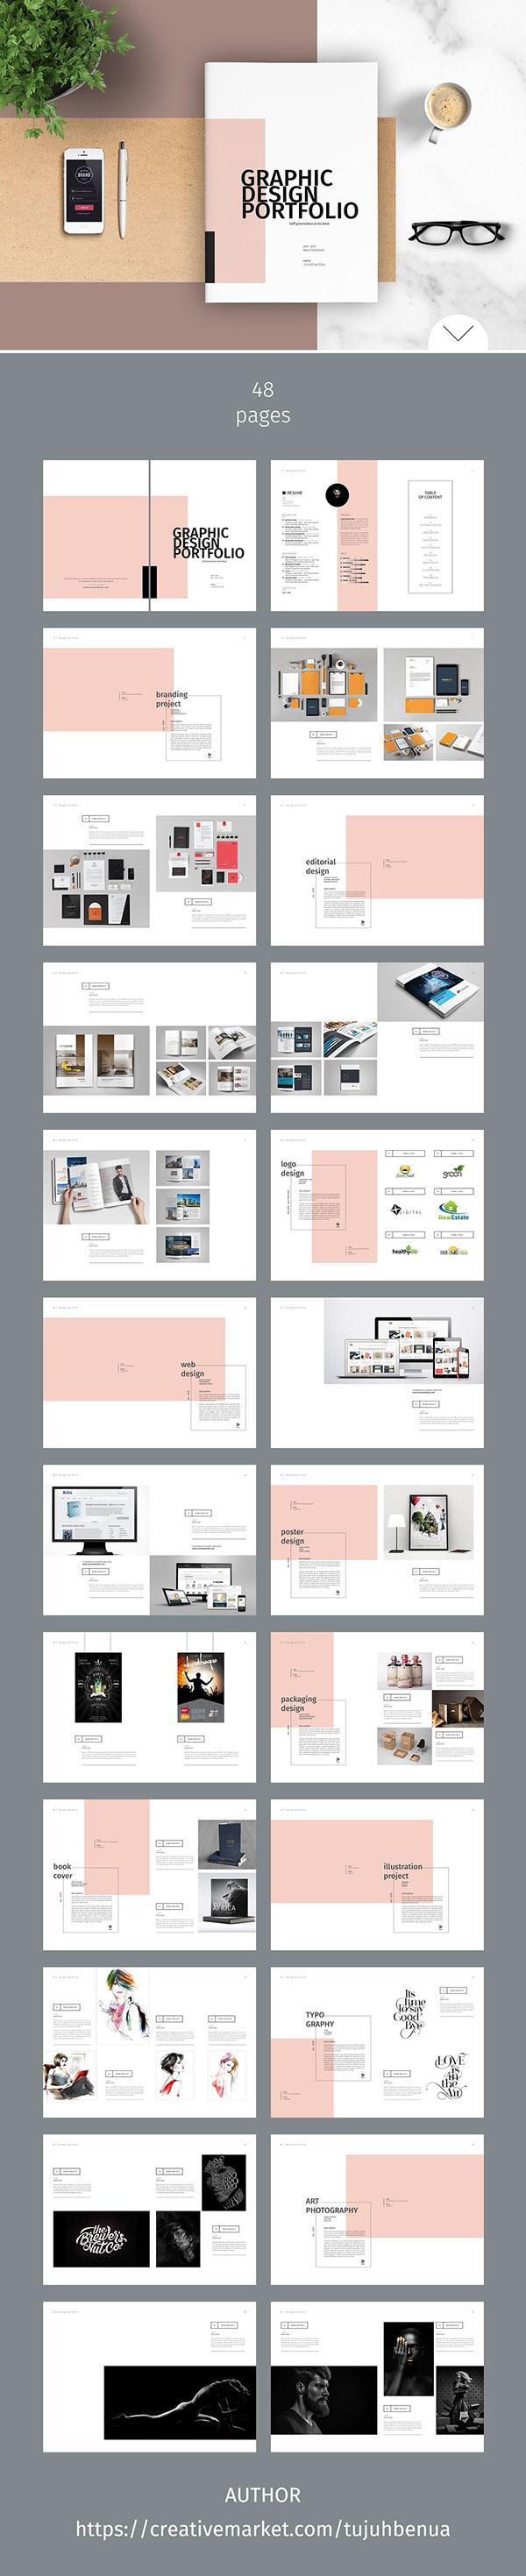 Graphic Design Portfolio Template On Behance